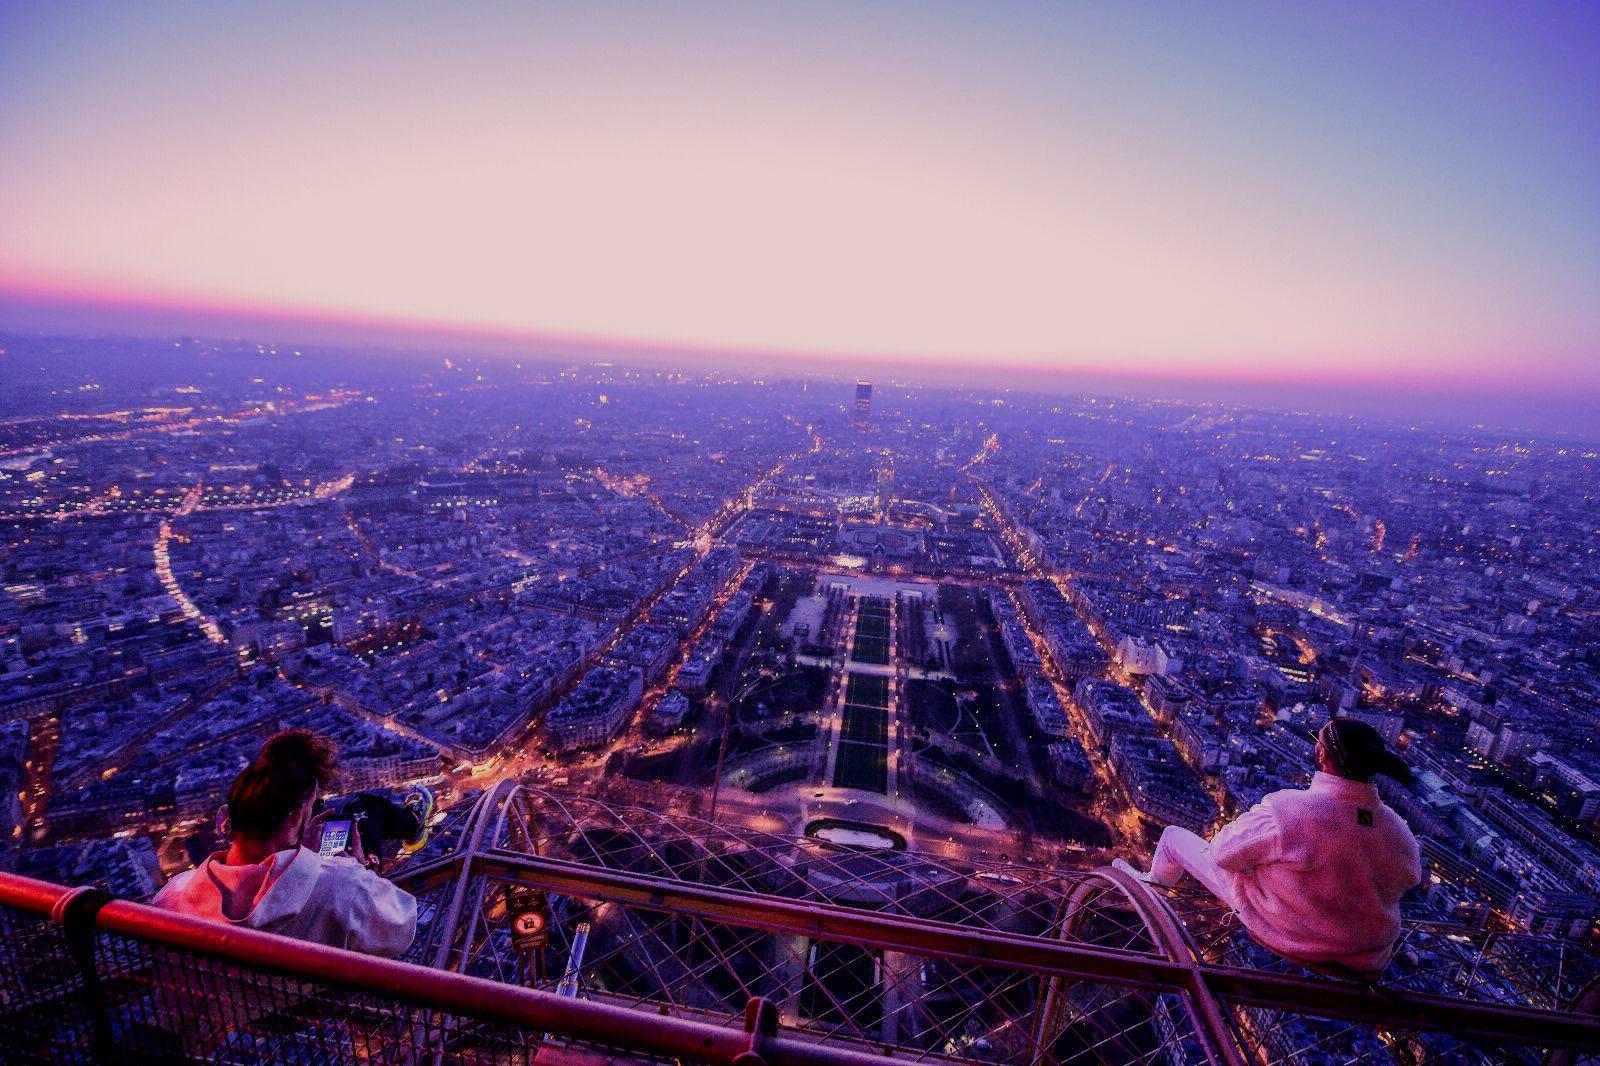 Wallpaper Pnl Hip Hop Eiffel Tower Paris France Ademo Nos Au Dd Rap 1600x1066 Psycho94 1587383 Hd Wallpapers Wallhere